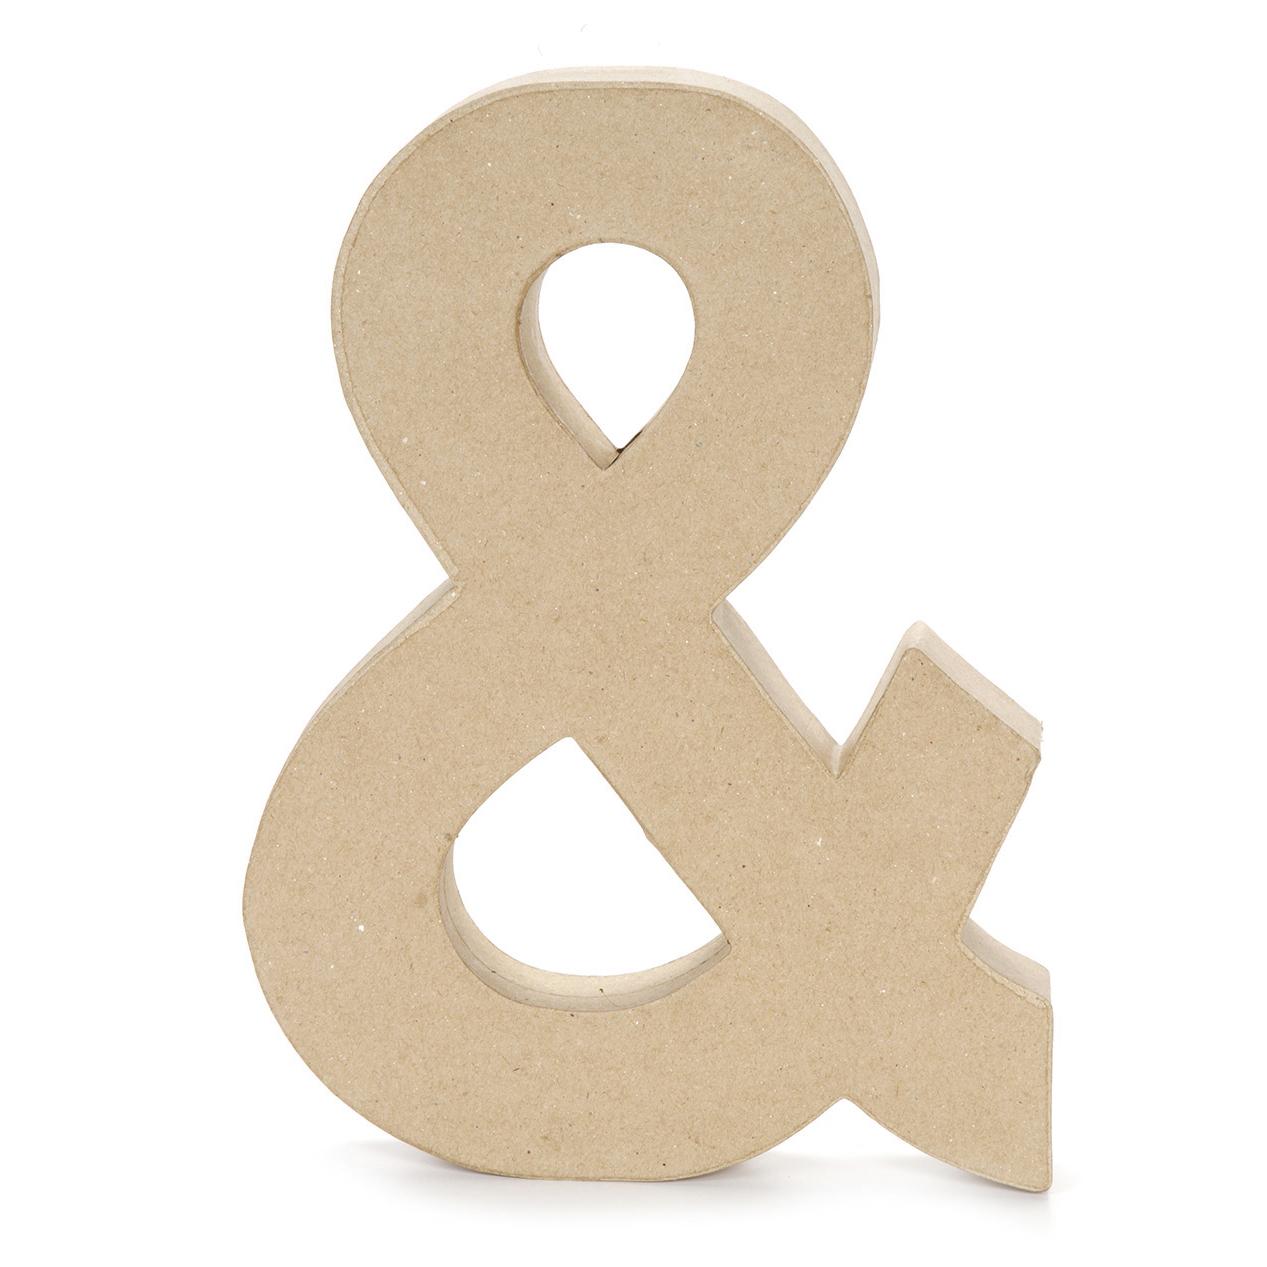 Paper Mache Letter Ampersand Symbol 12 X 15 Inch Joann